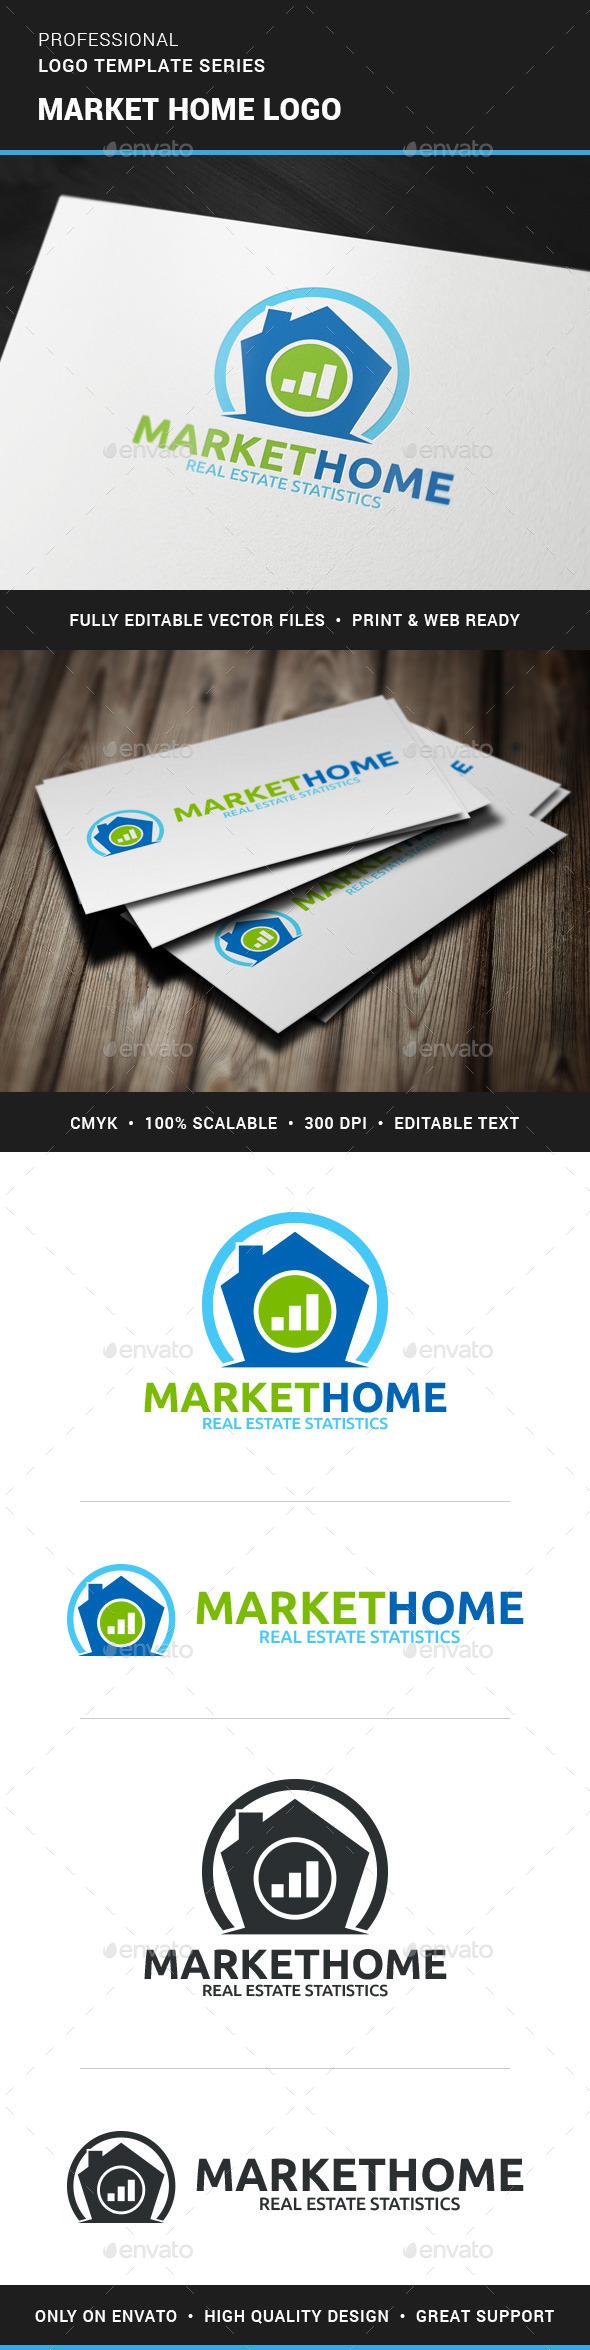 Marketing Home Logo Template - Buildings Logo Templates